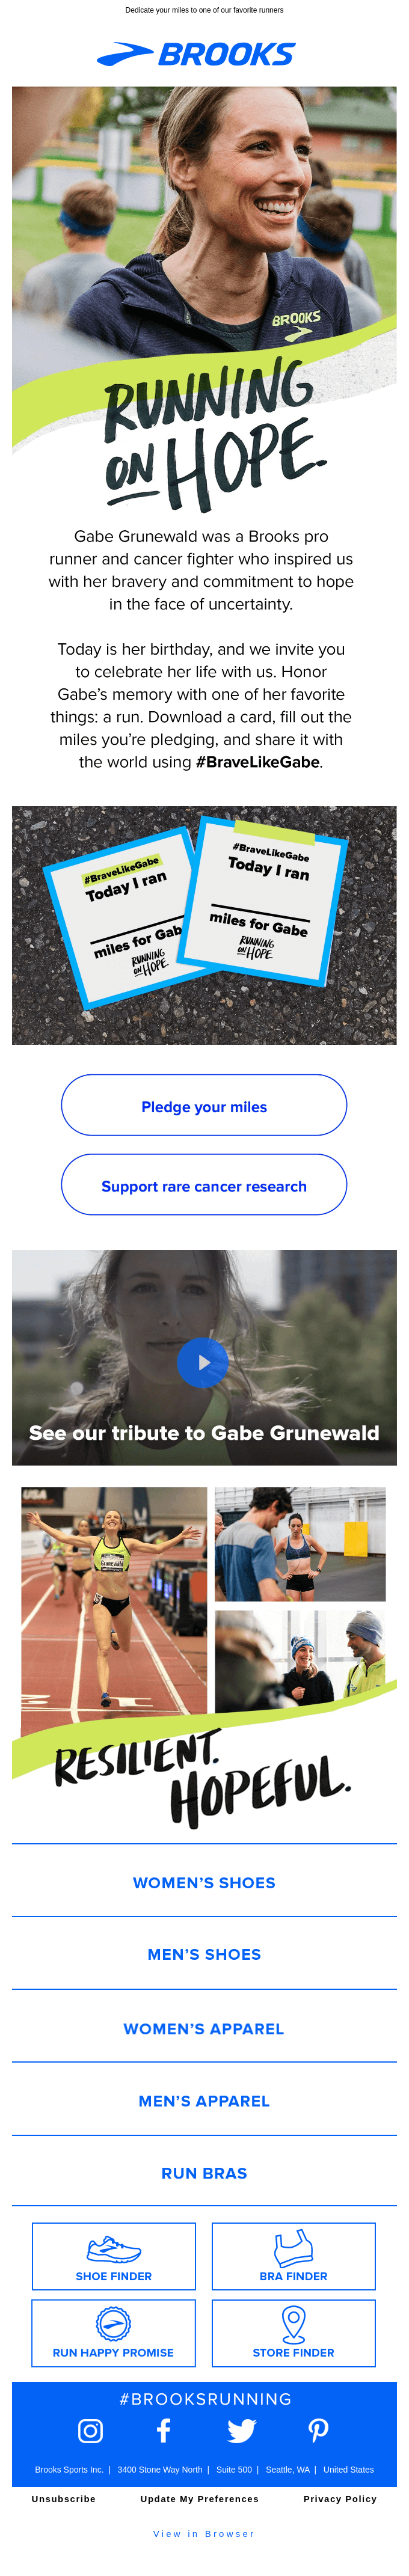 Celebrate Gabe Grunewald